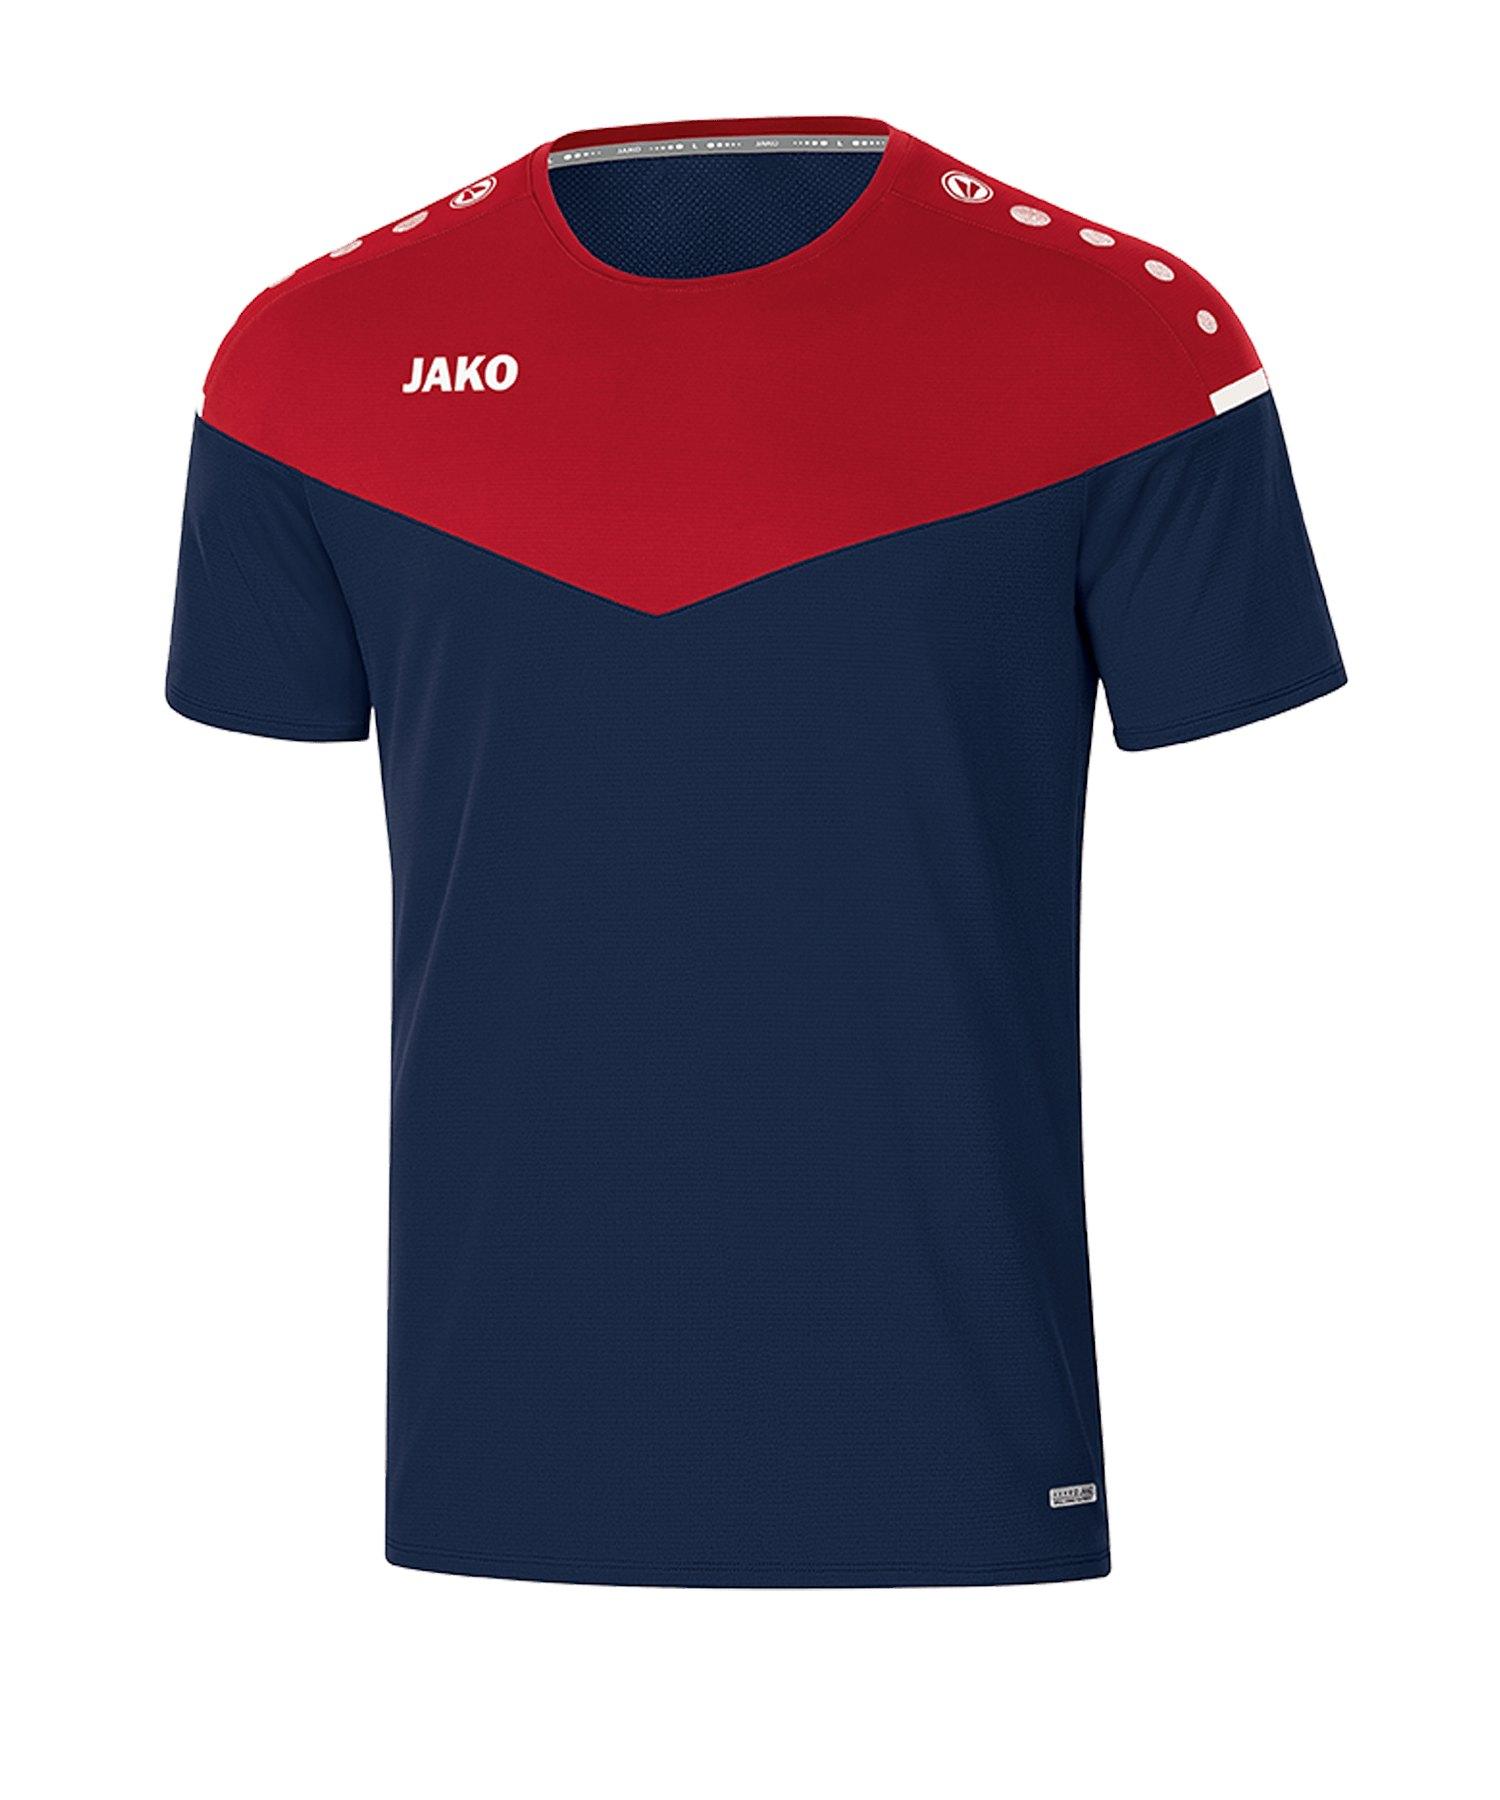 Jako Champ 2.0 T-Shirt Blau F91 - blau